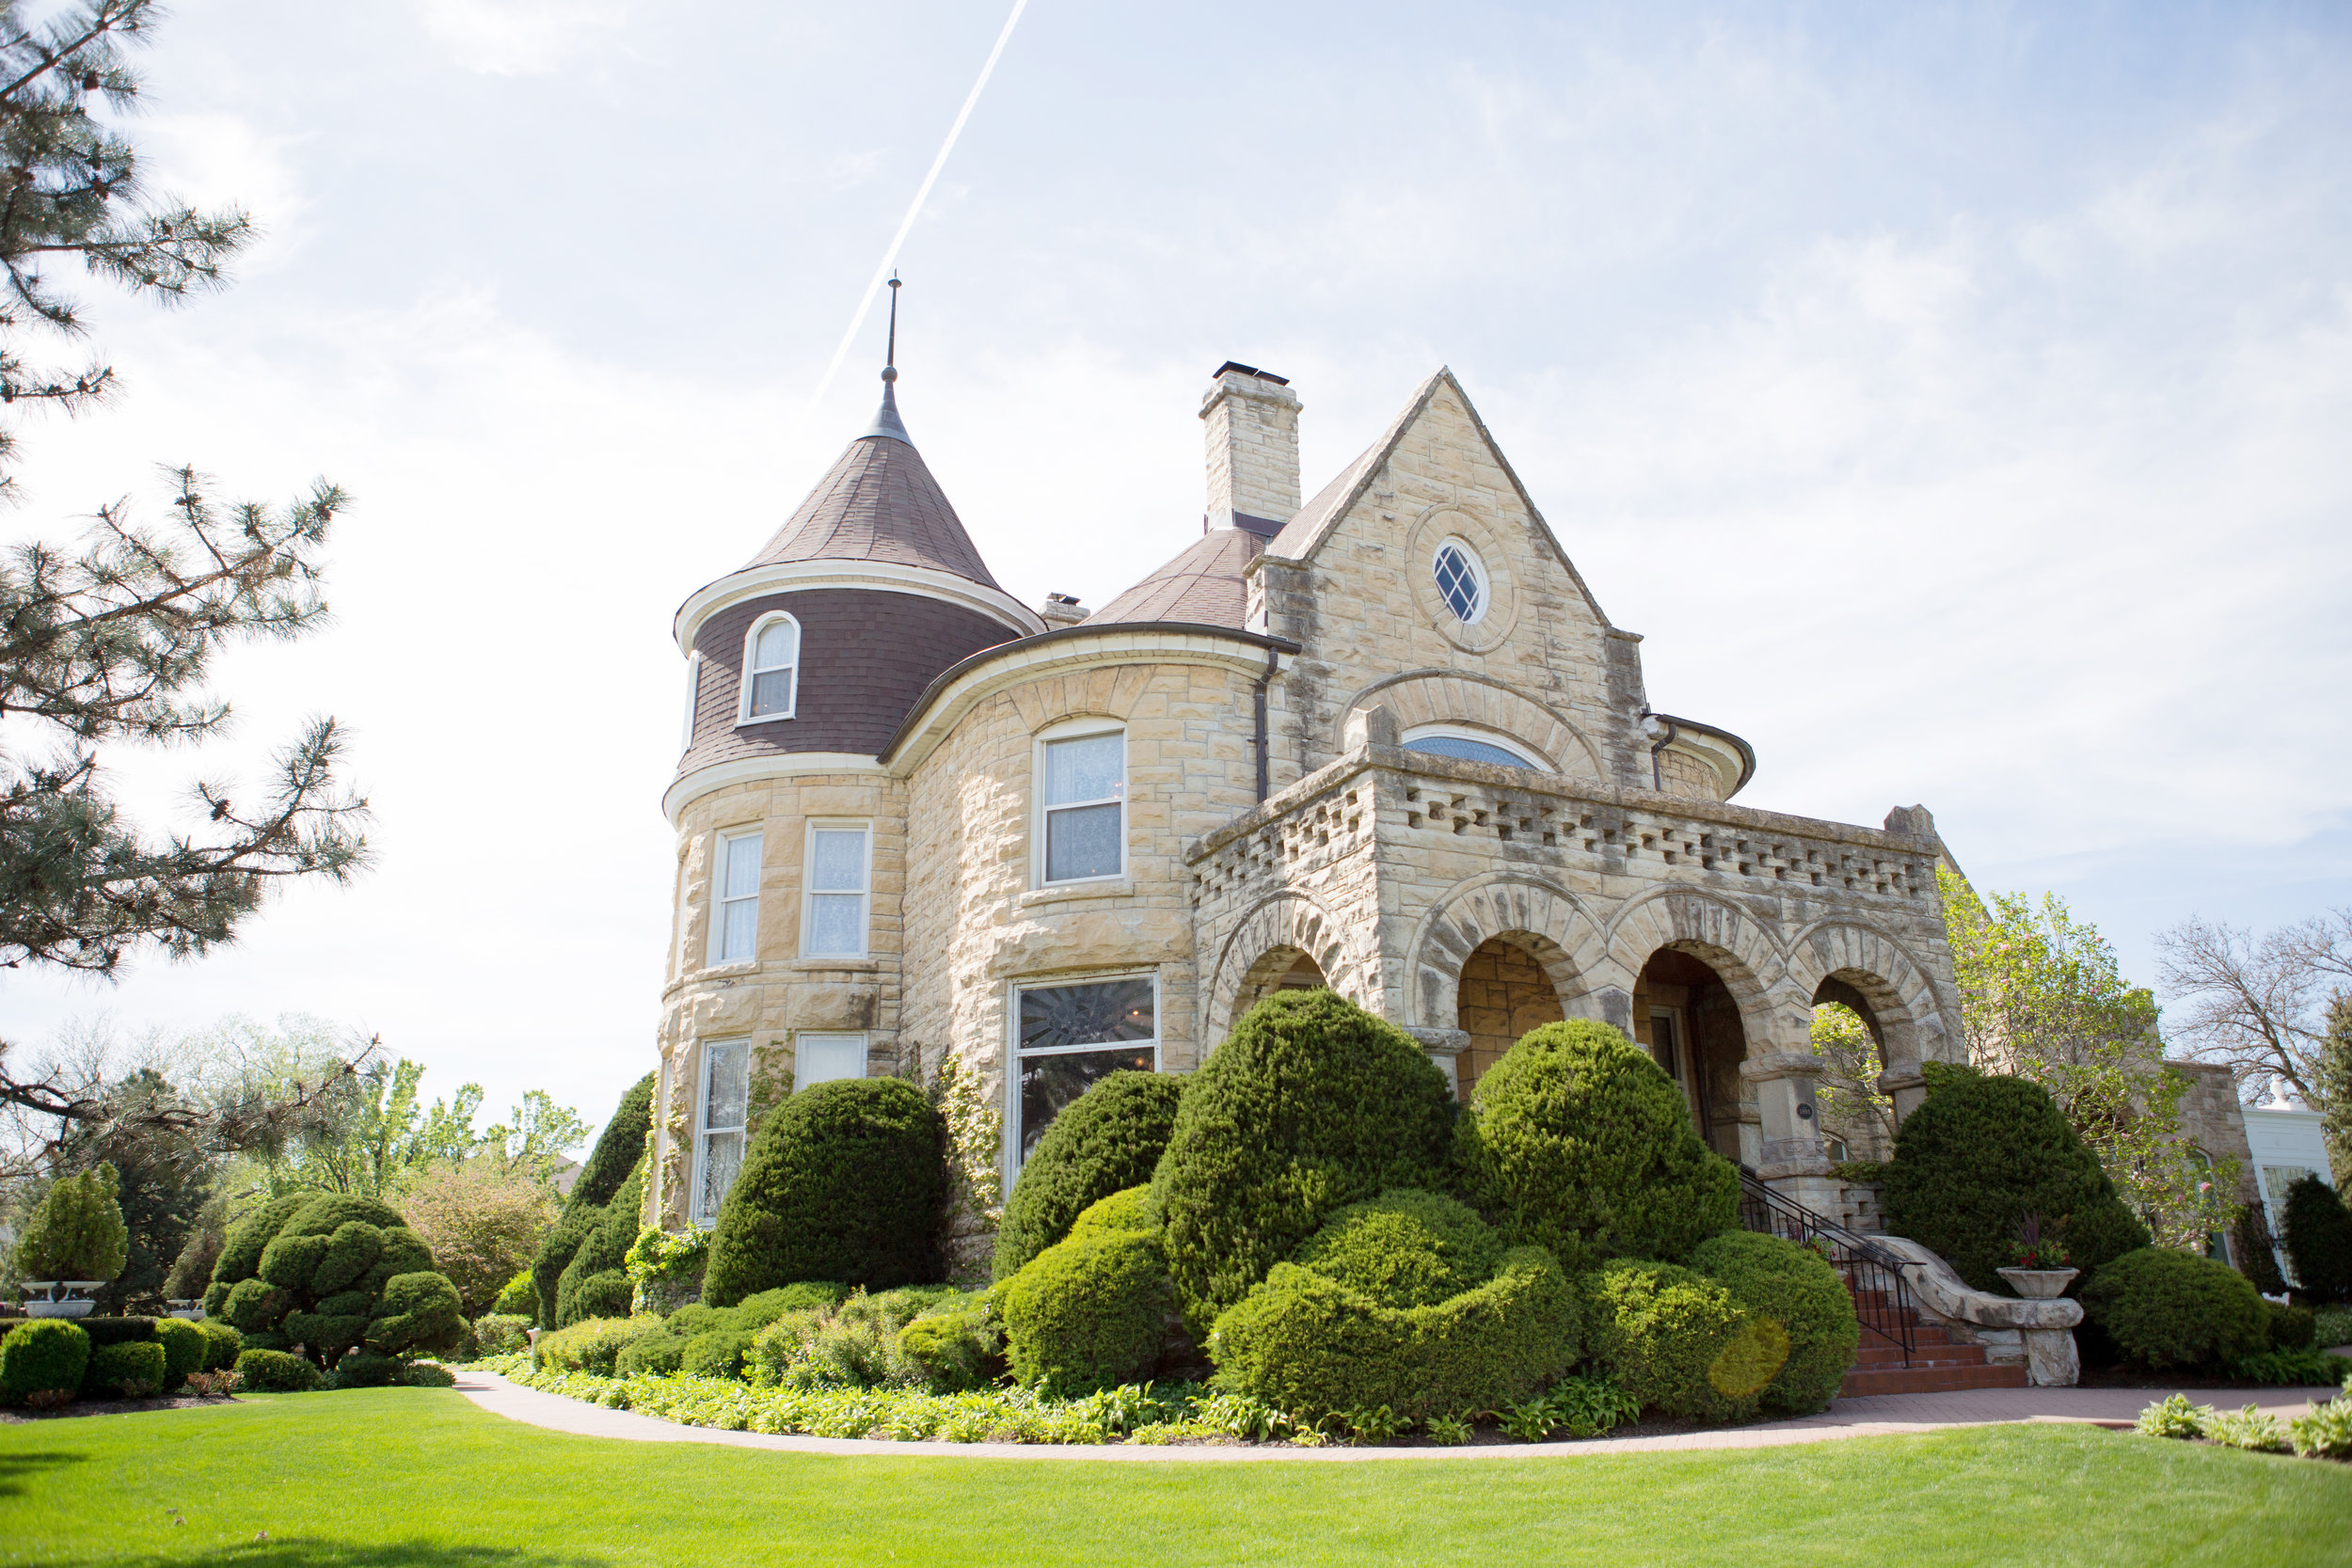 patrick-haley-mansion-joliet-illinois.jpg